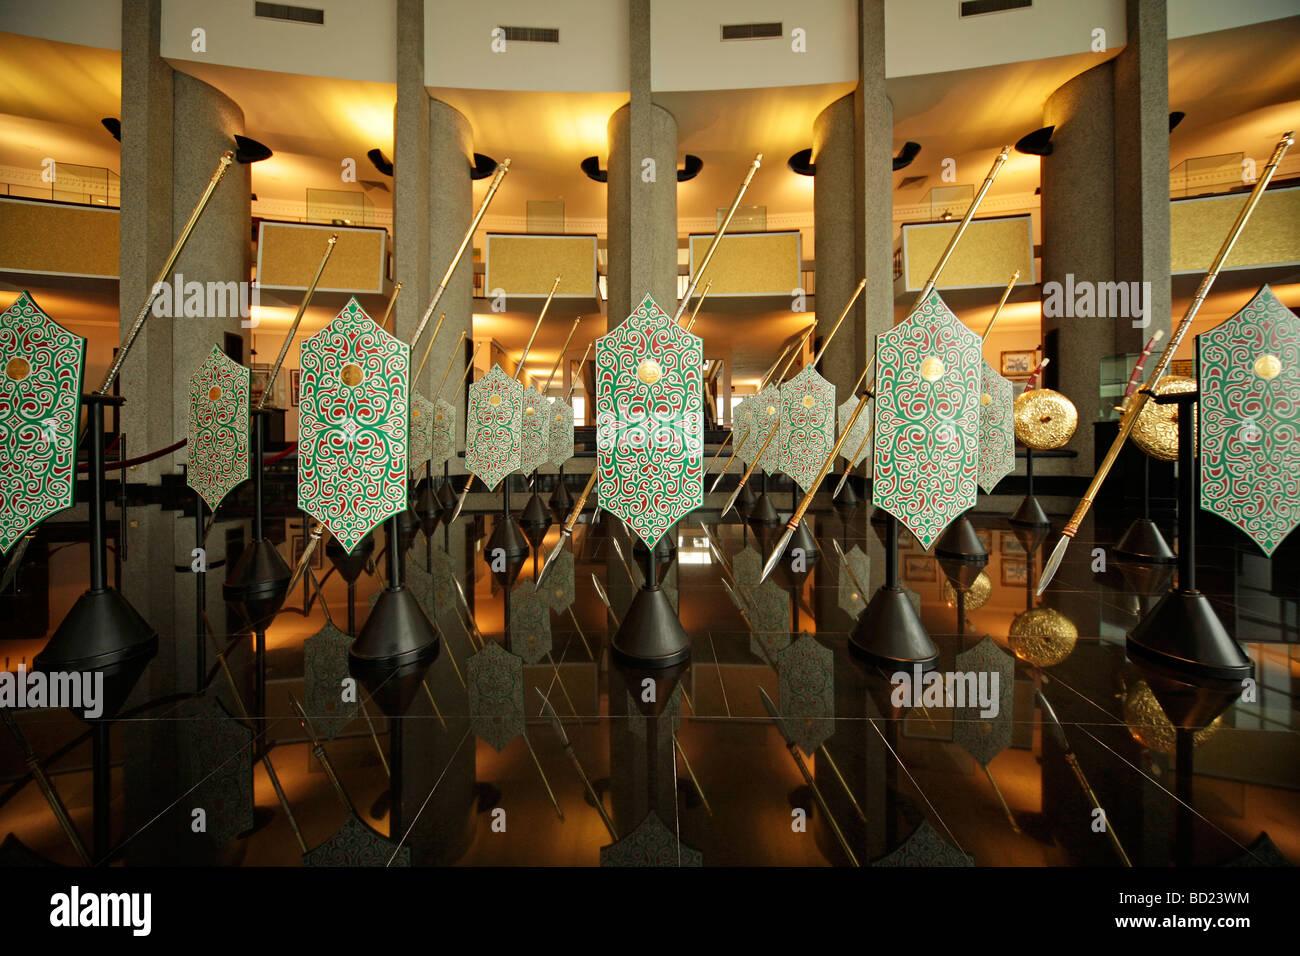 weapons and shield Royal Treasury Royal Regalia Museum in the capital city Bandar Seri Begawan Brunei Asia - Stock Image